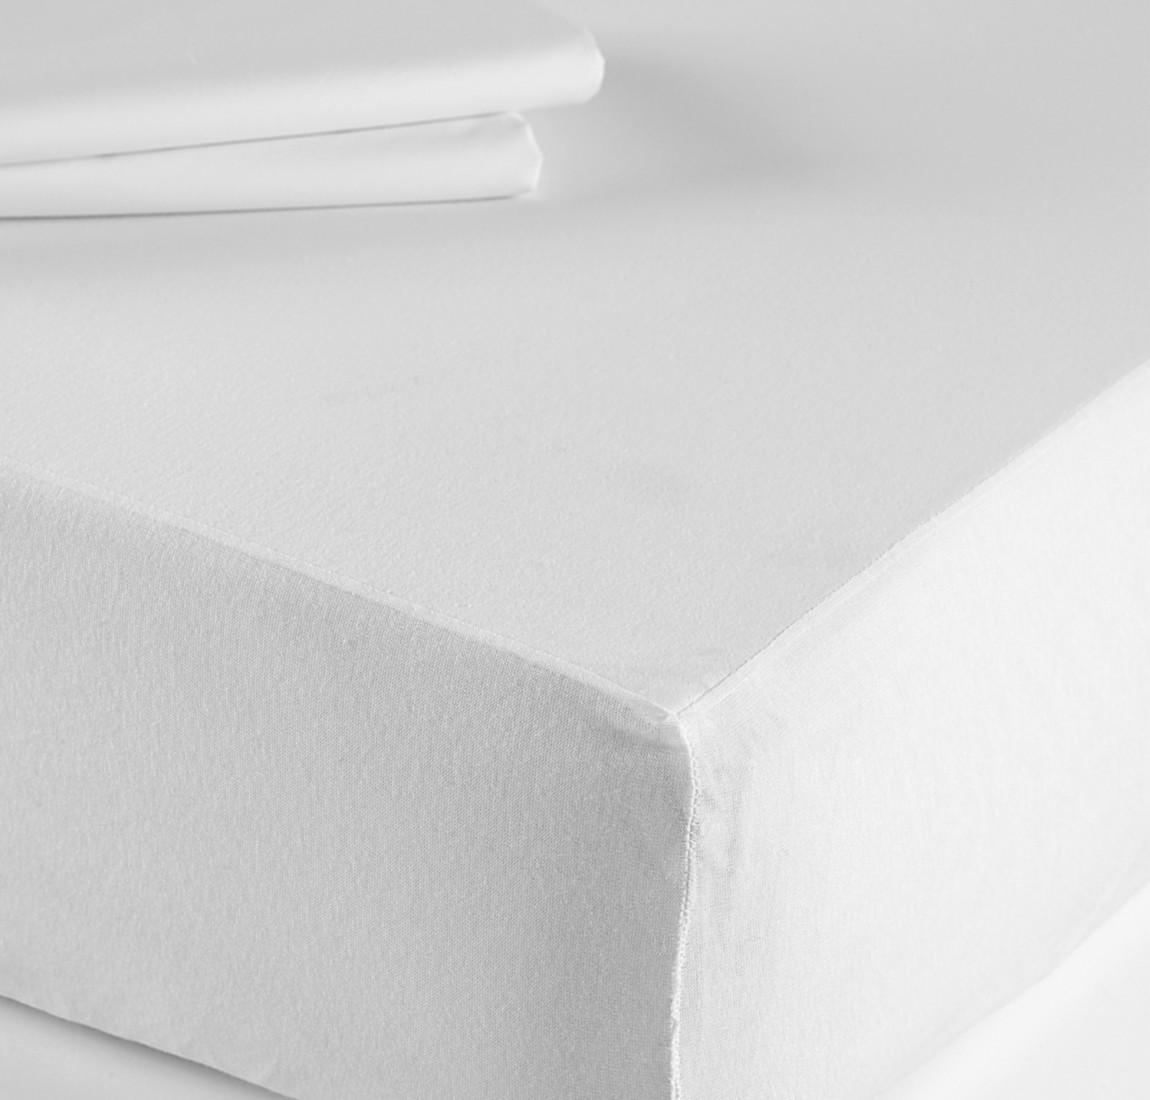 matratzenschoner fixmolton ms 10 g nstig online bestellen im elmarket online shop. Black Bedroom Furniture Sets. Home Design Ideas